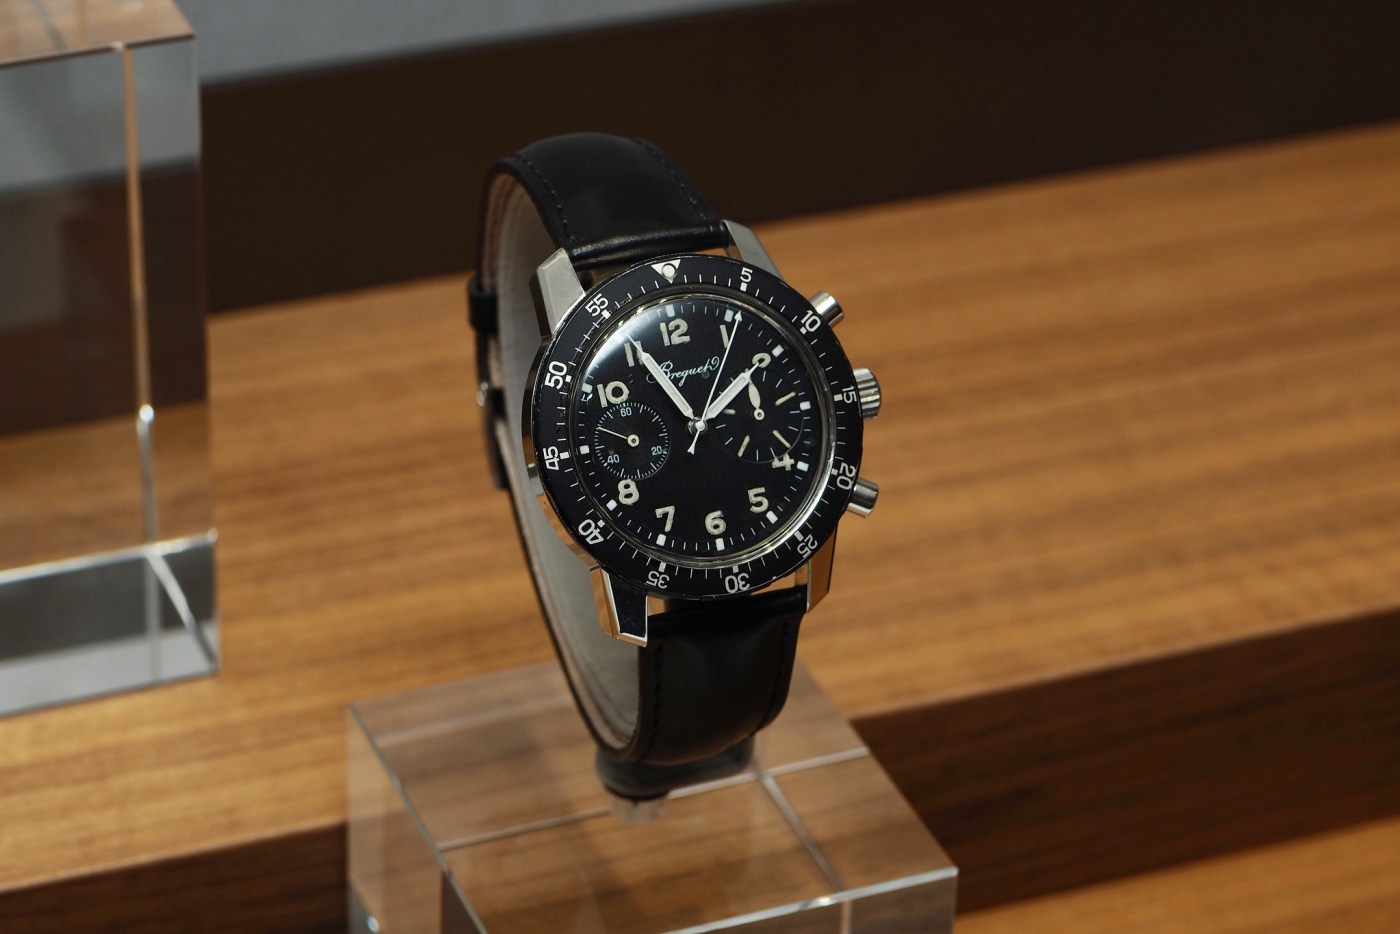 Type 20 wristwatch chronograph, second-generation